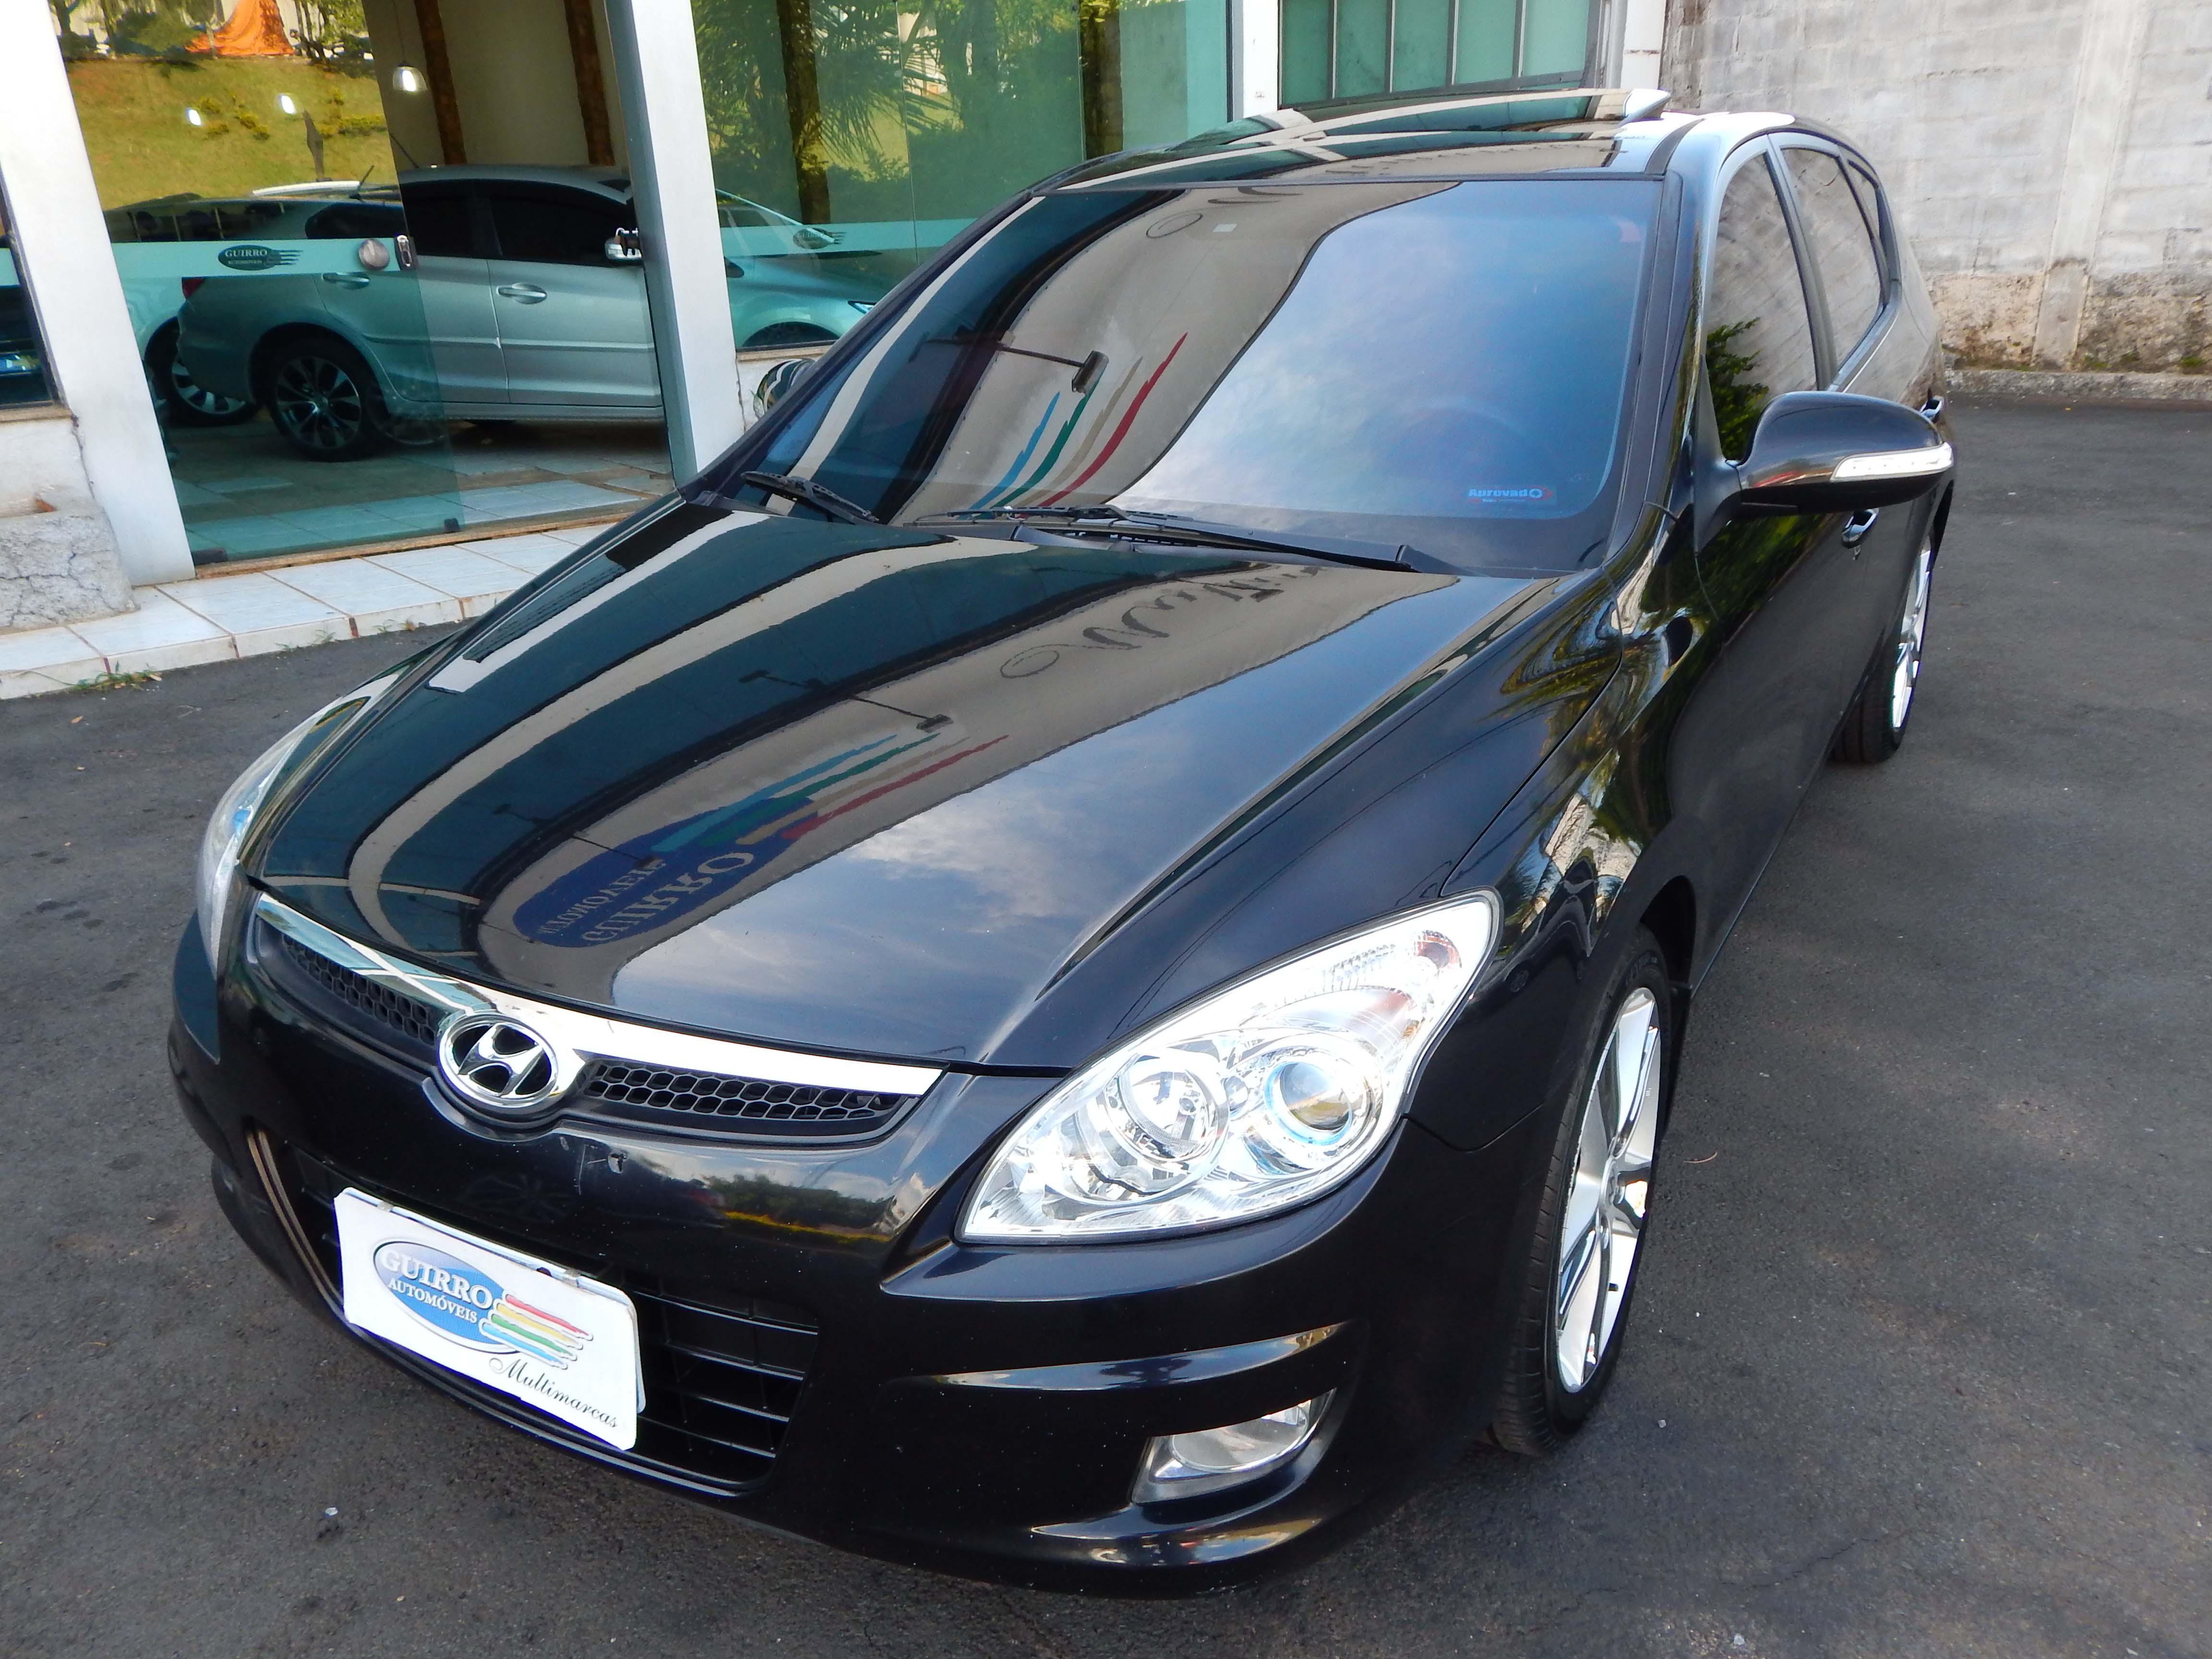 2009/2010 - Gasolina